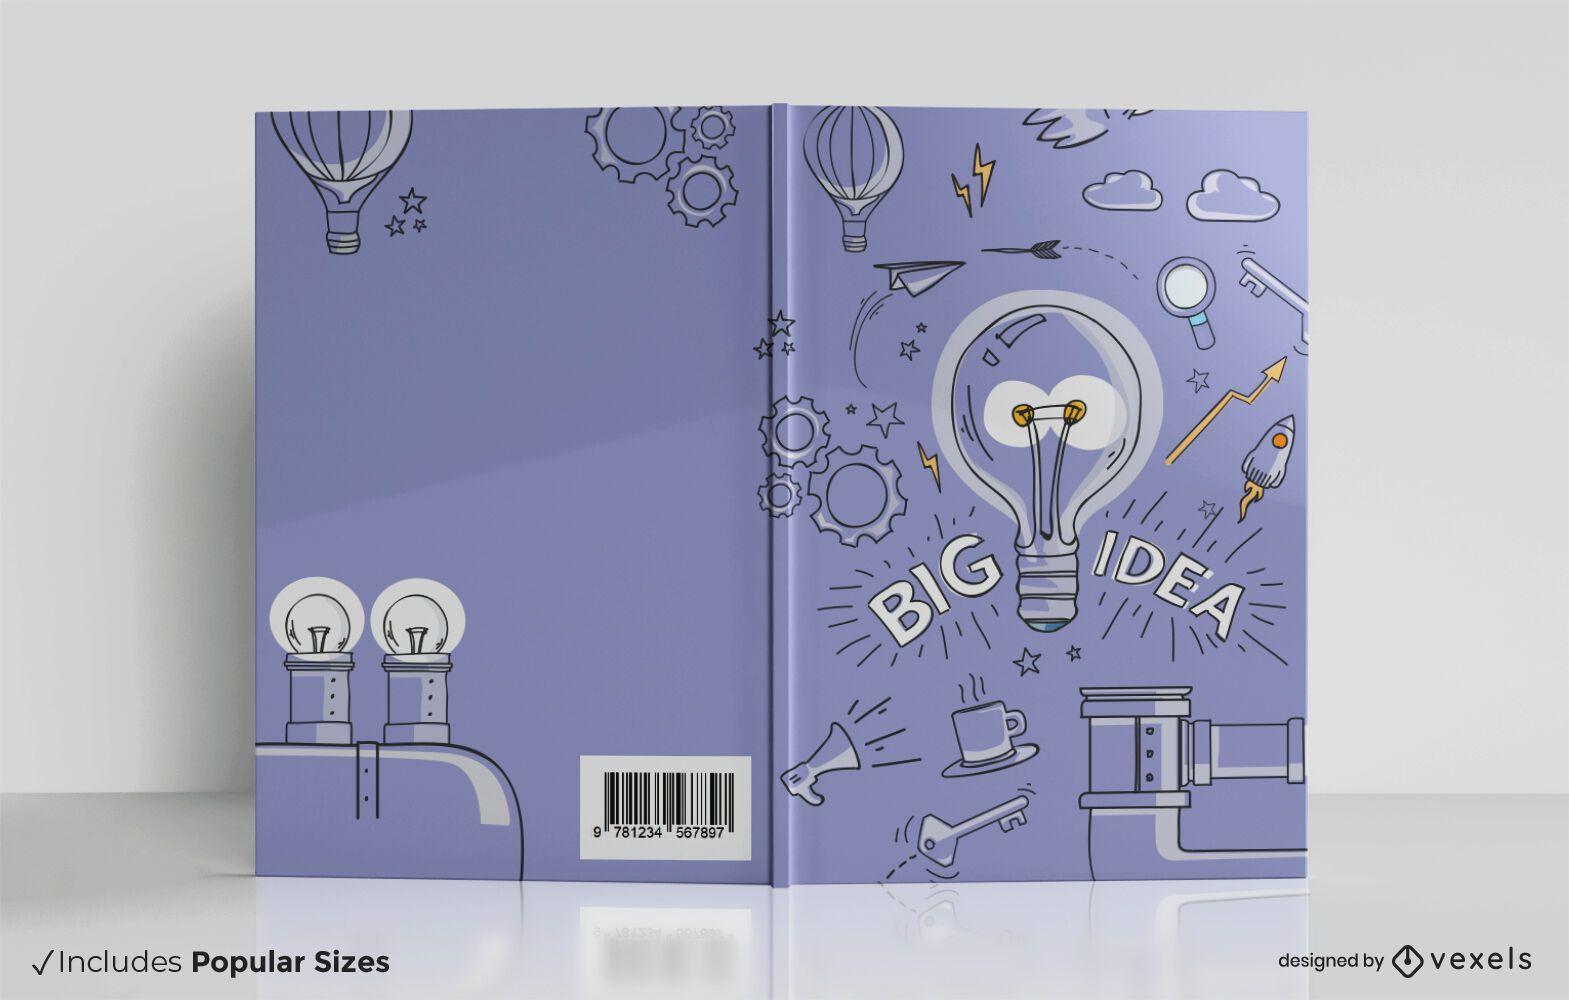 Big ideas book cover design